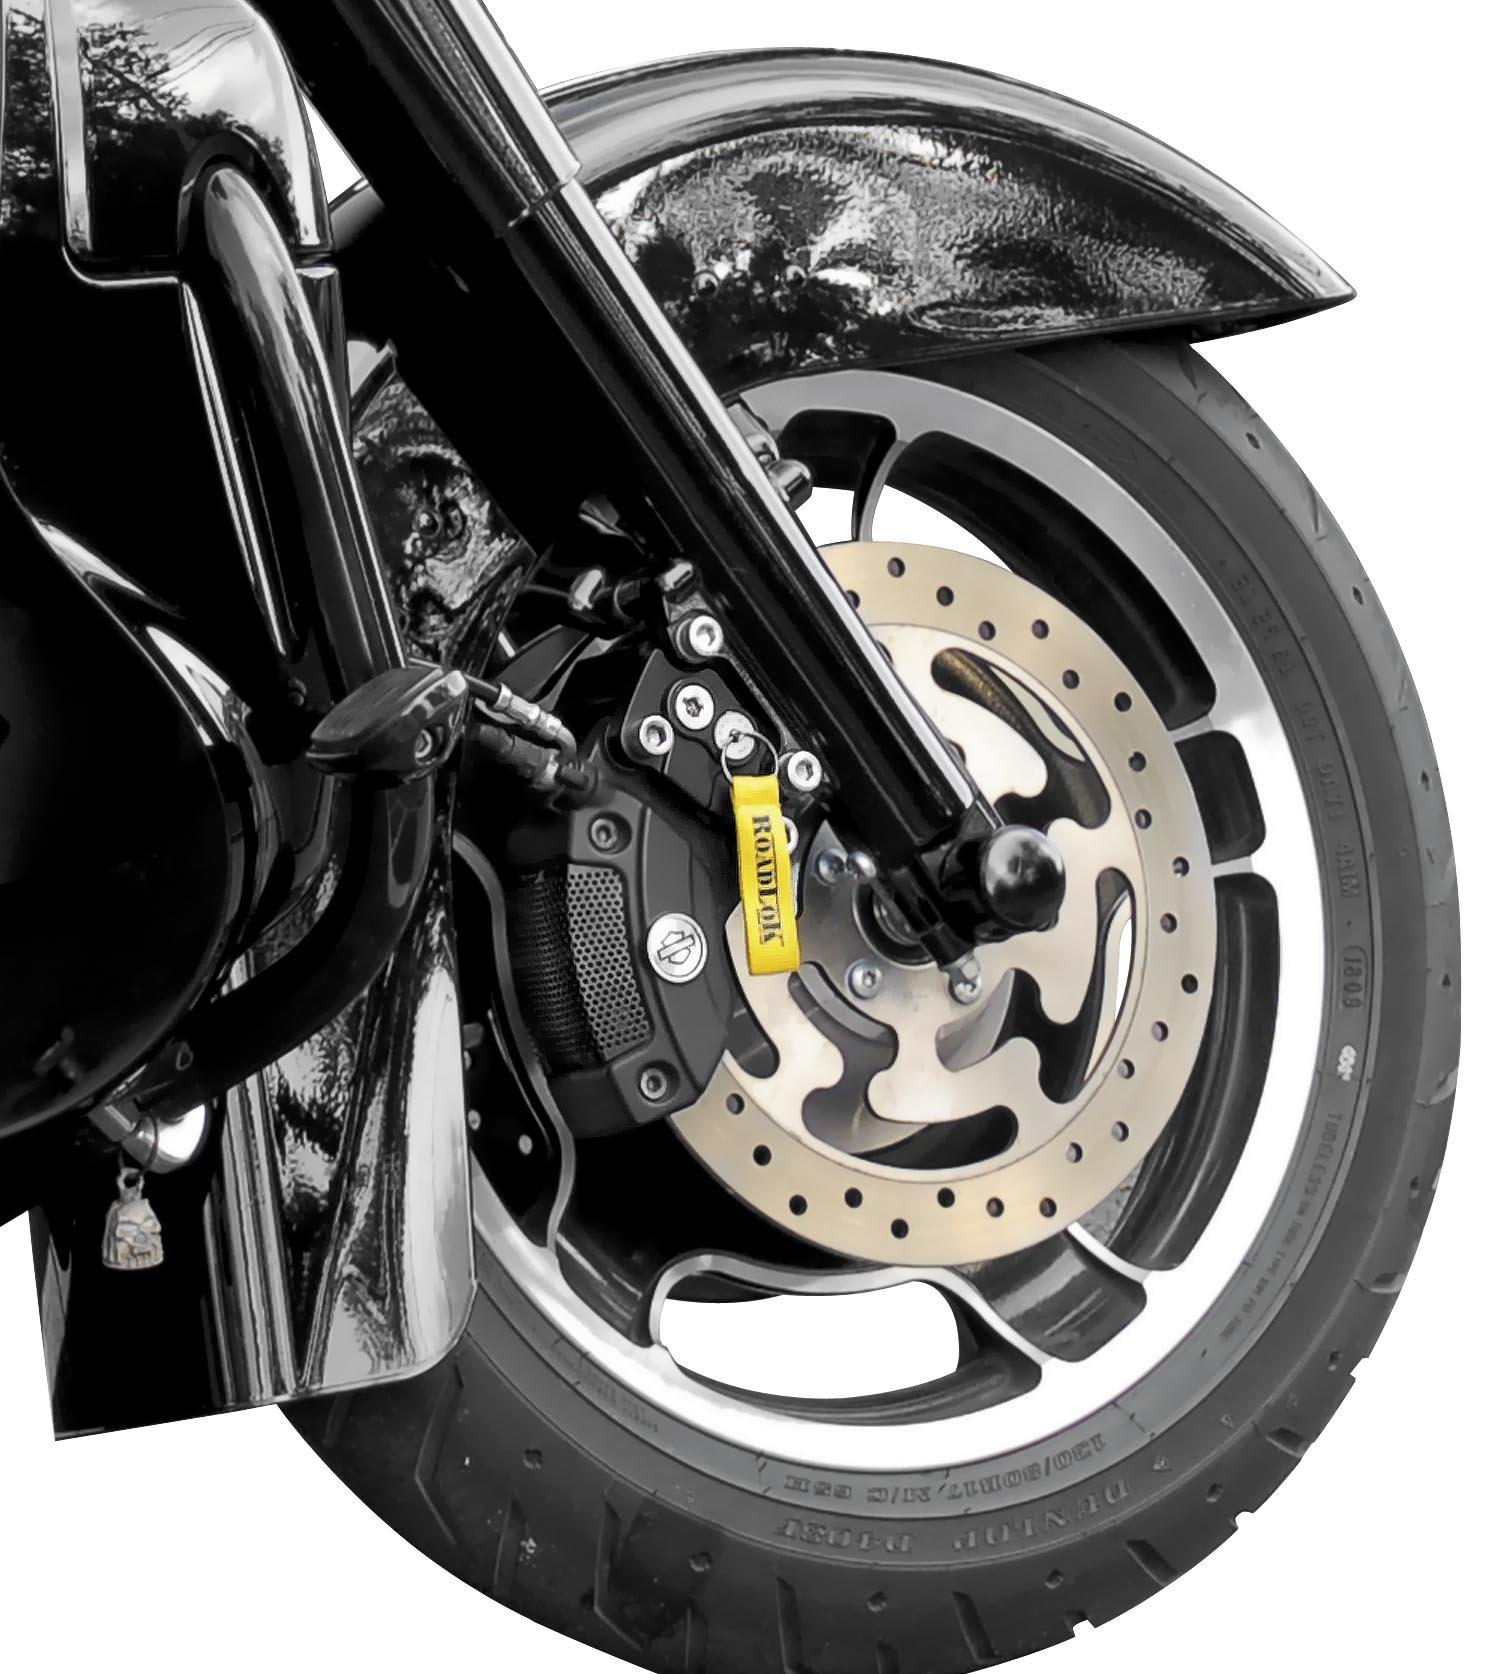 Roadlok XD Black Anti-Theft System for 2000-2010 Harley Davidson FLH/FLT by RoadLok